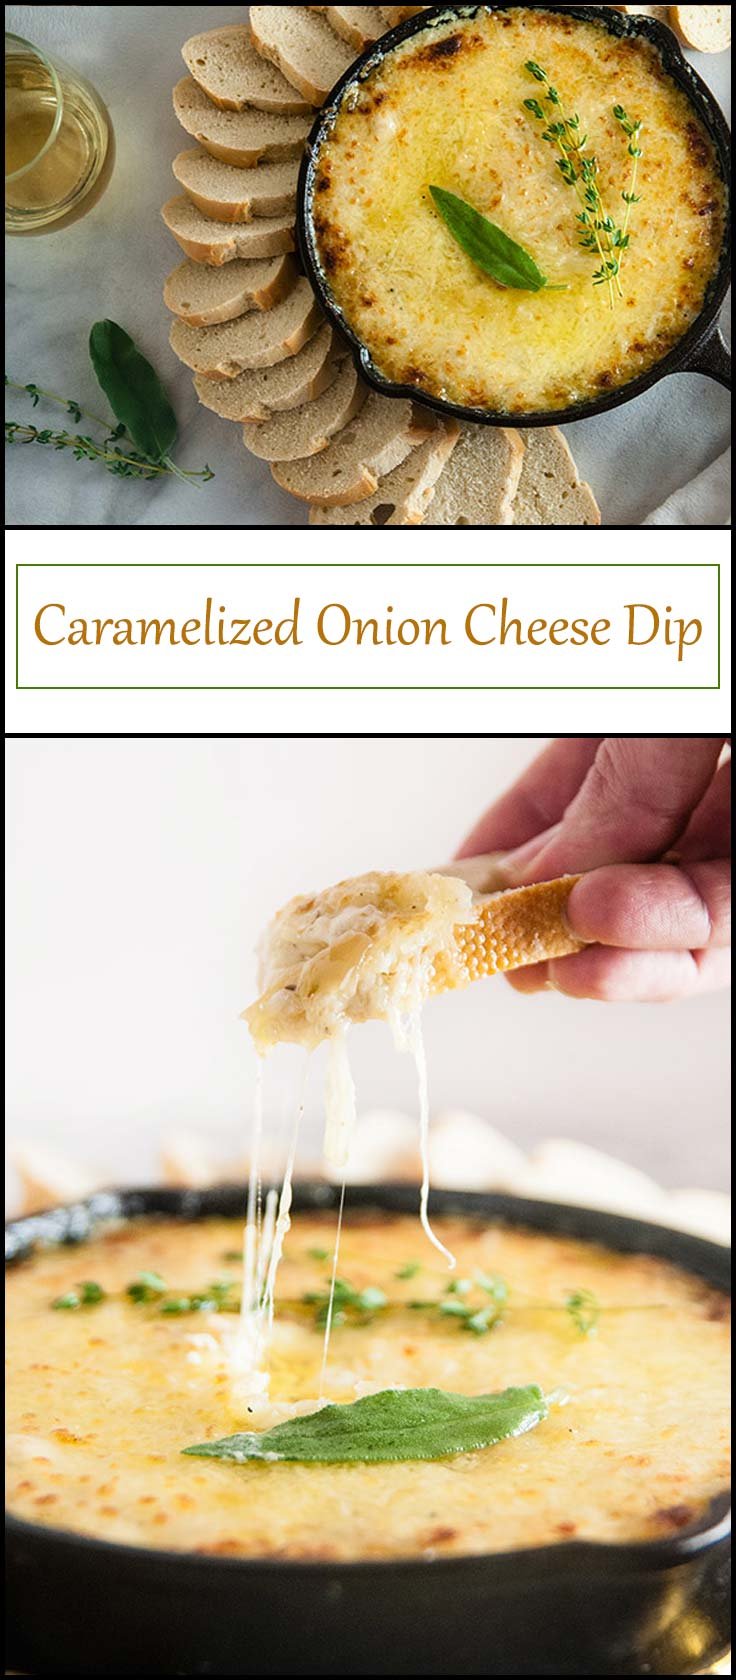 Caramelized Onion Cheese Dip from www.seasonedsprinkles.com